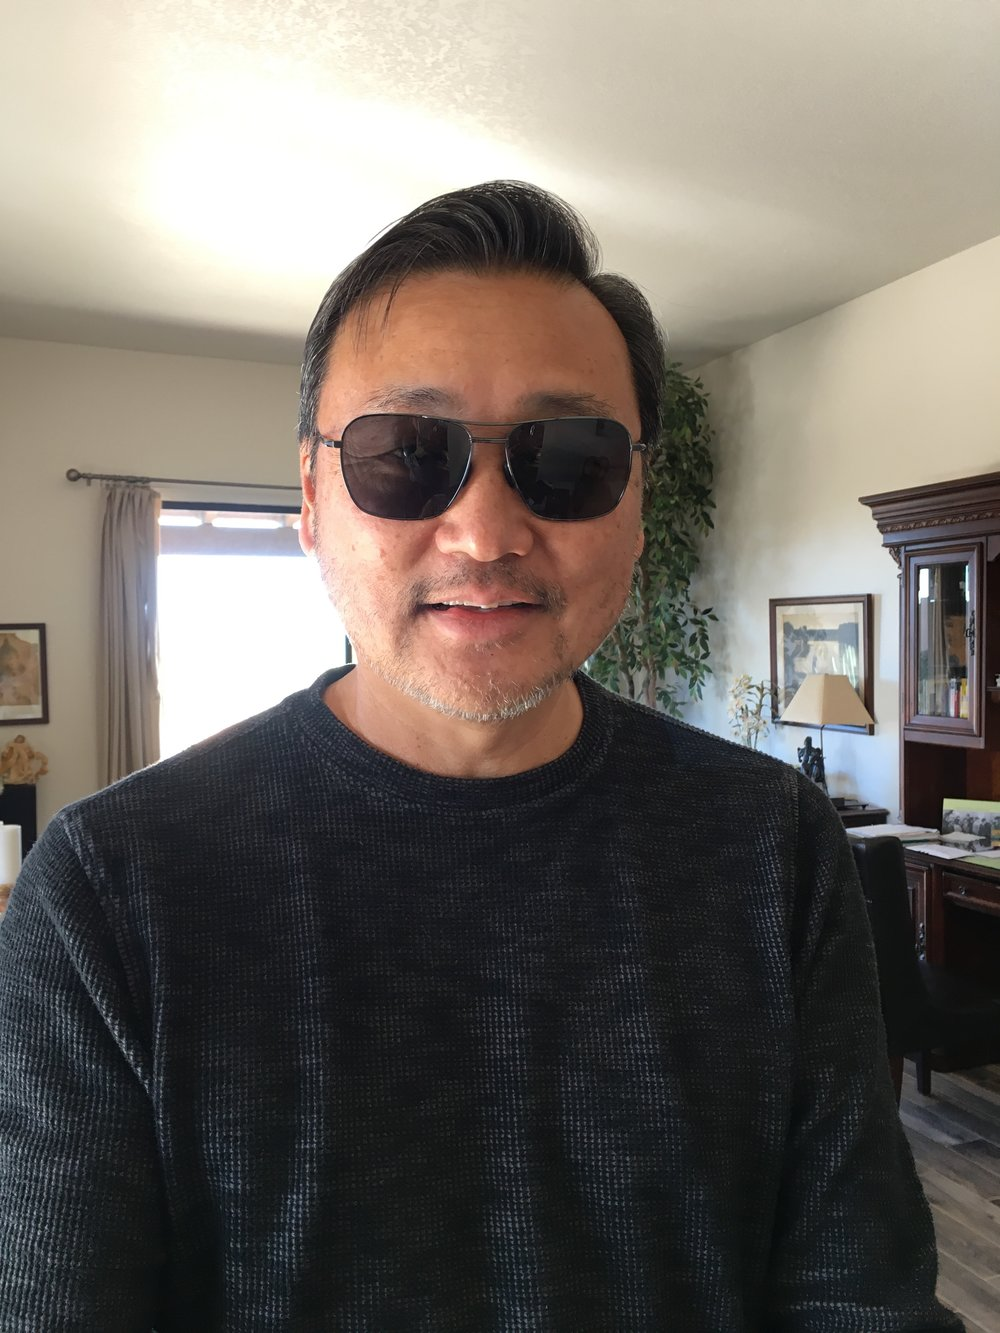 RUSTY KATSUKI - Co-Founder & CFO